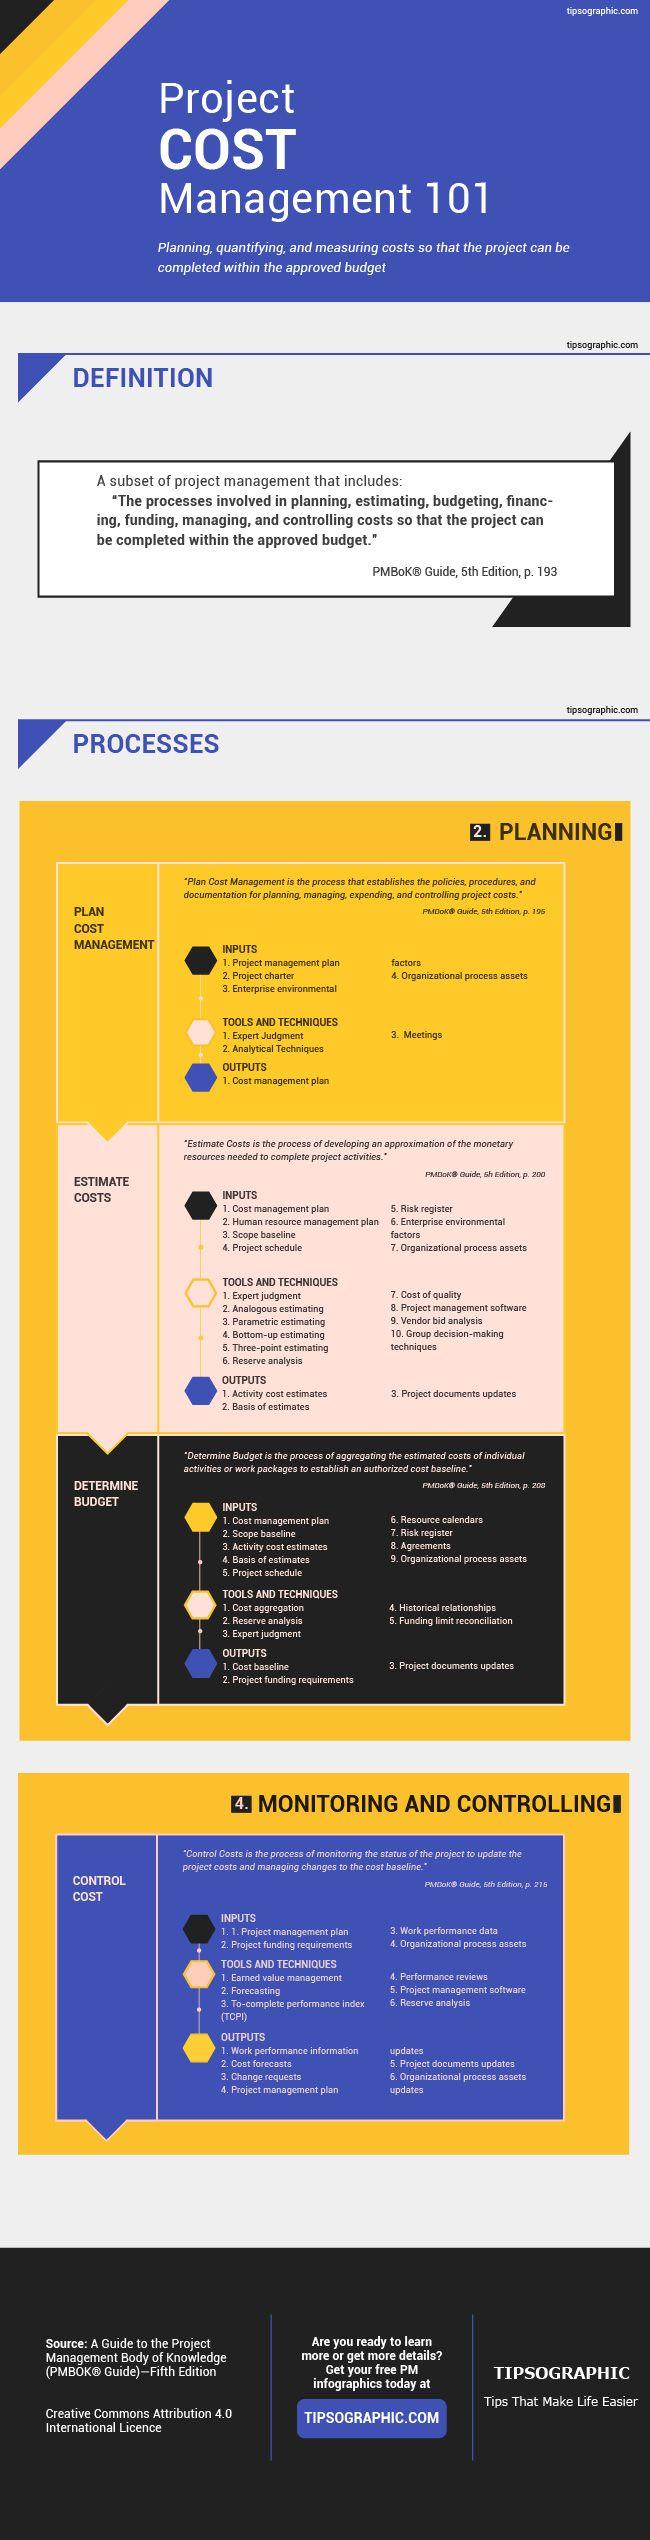 34 Best Pmp Exam Images On Pinterest Project Management Business